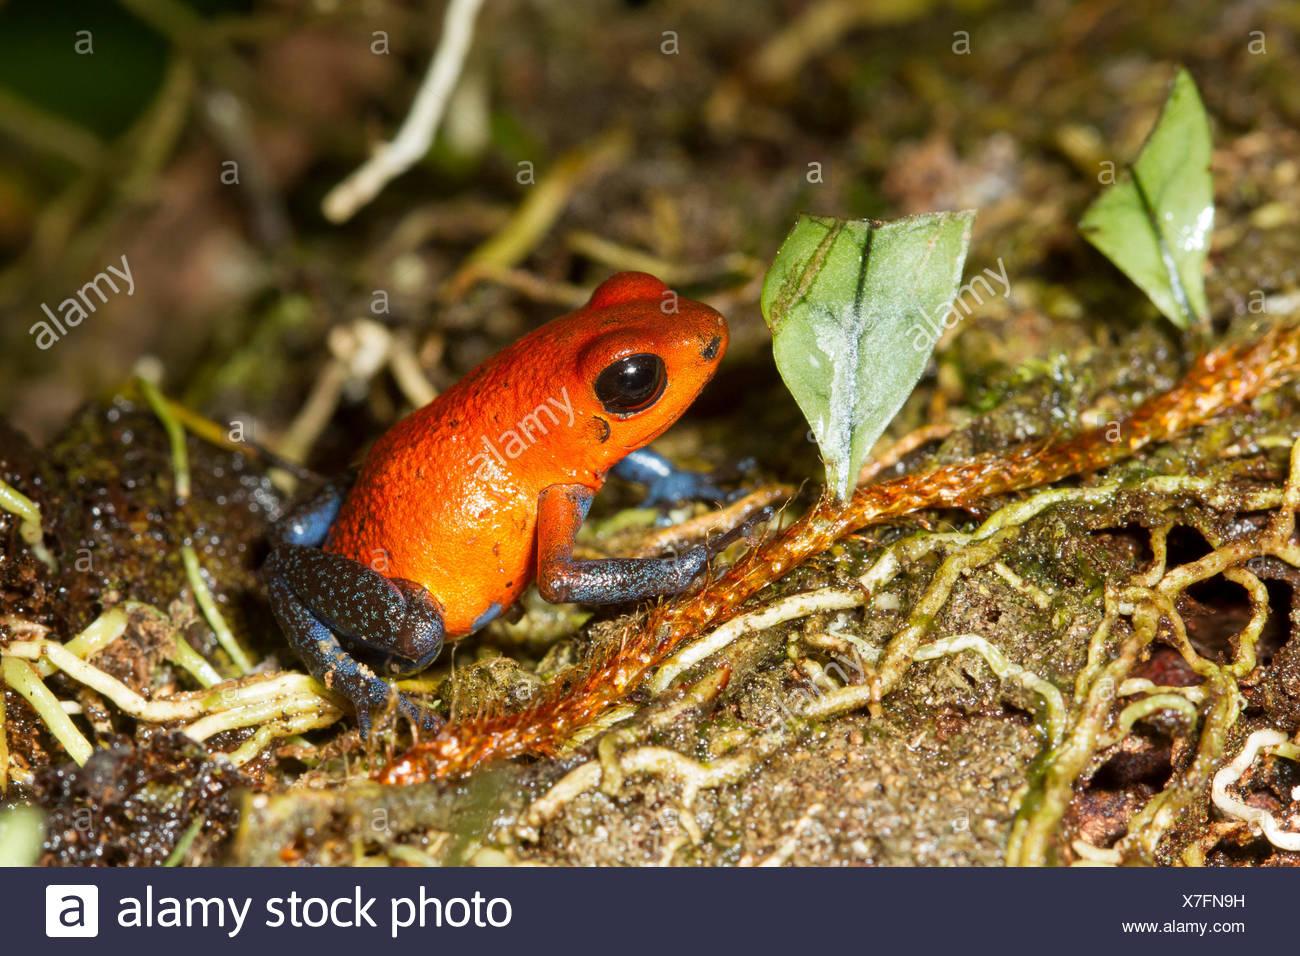 Strawberry poison dart frog, Oophaga pumilio Costa Rica, Central America, - Stock Image